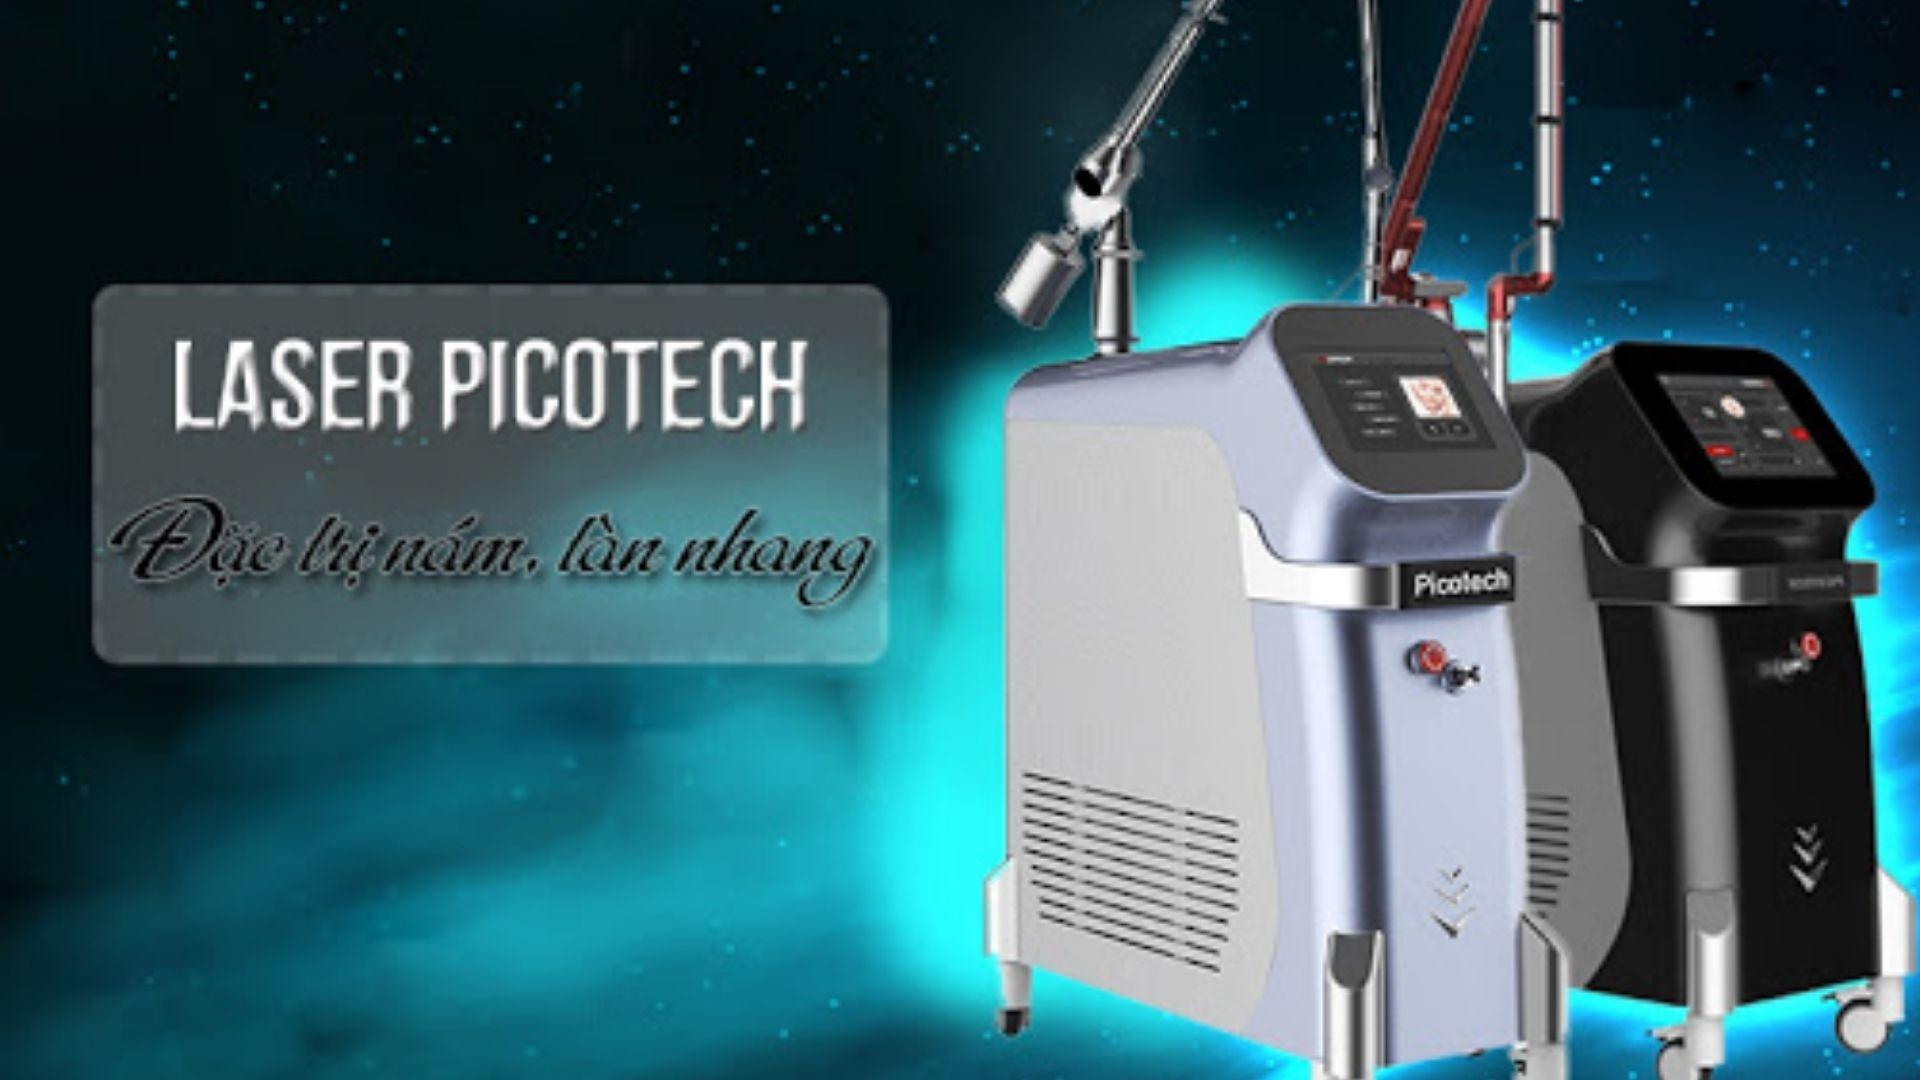 Tìm hiểu về laser picotech